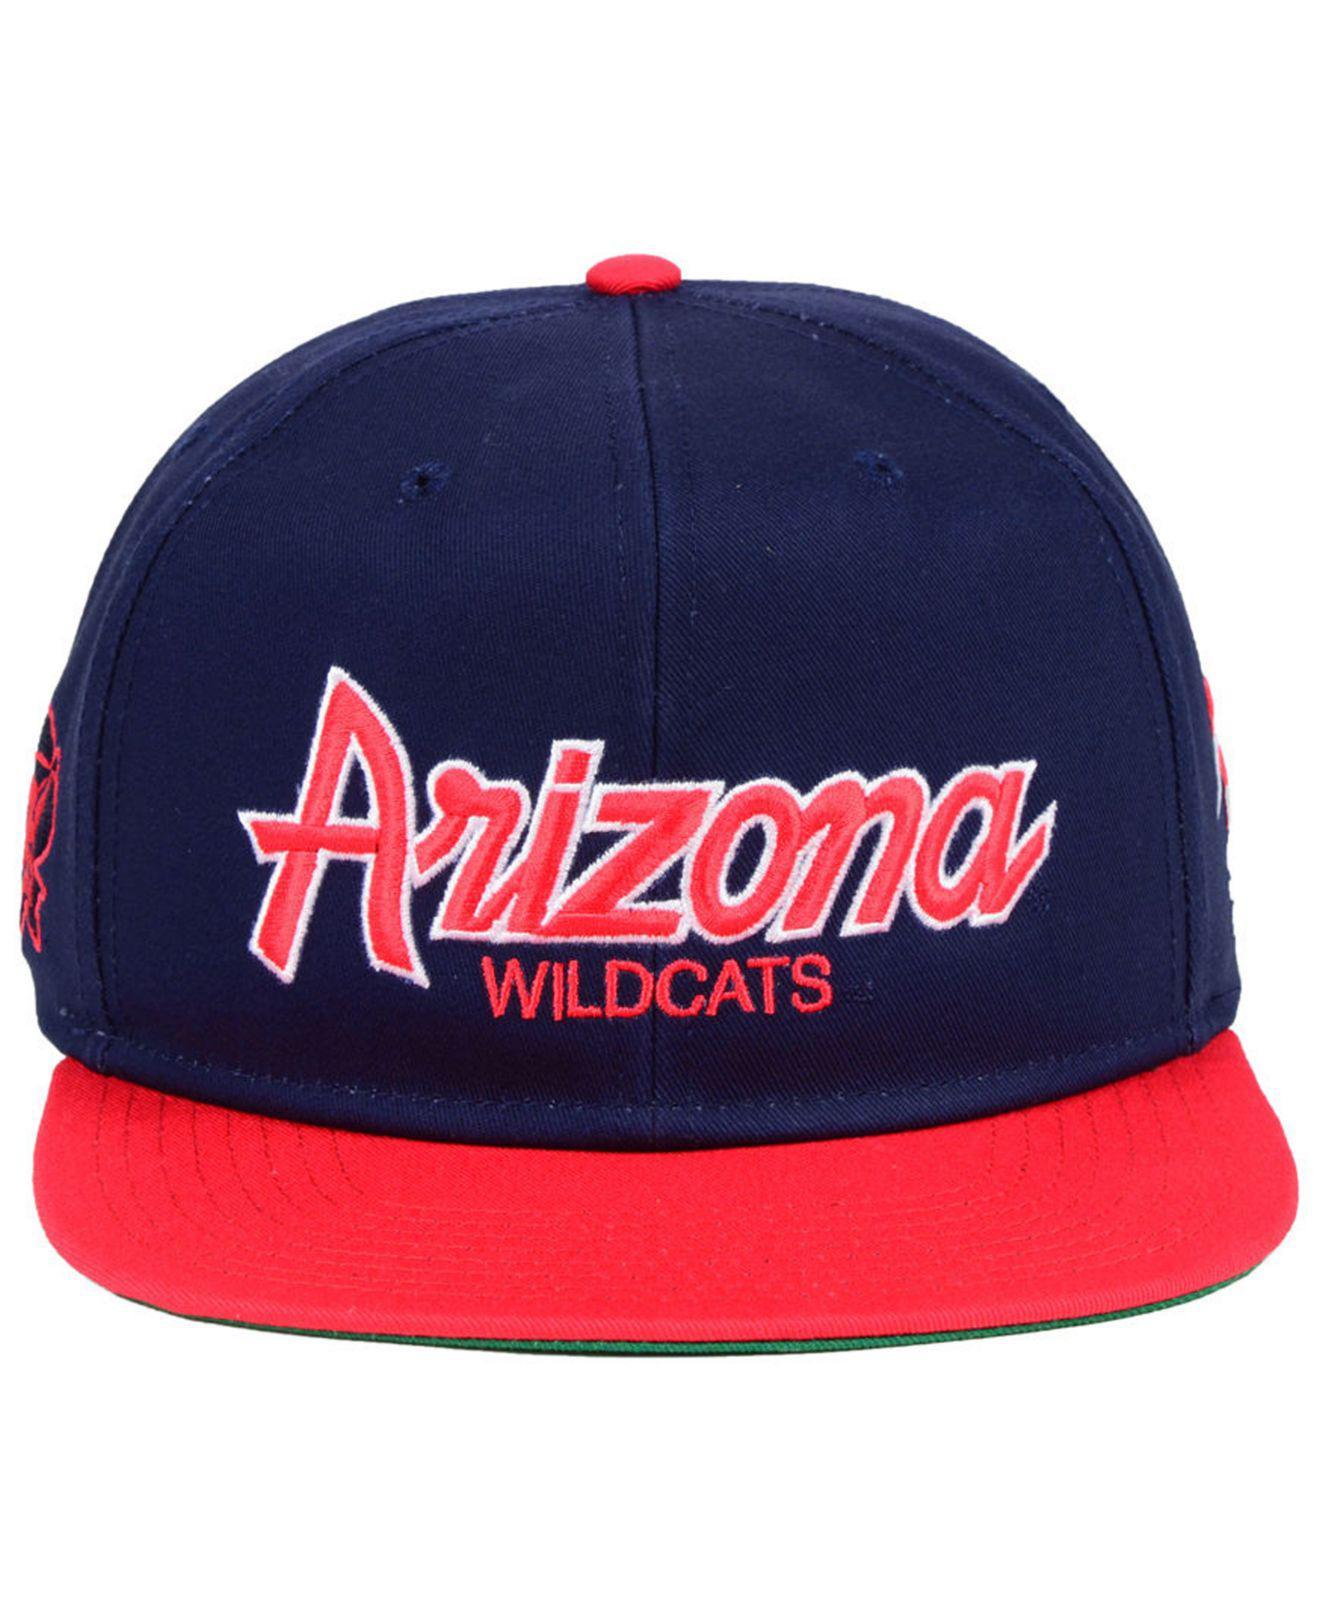 2a0e077381c Lyst - Nike Arizona Wildcats Sport Specialties Snapback Cap in Blue for Men